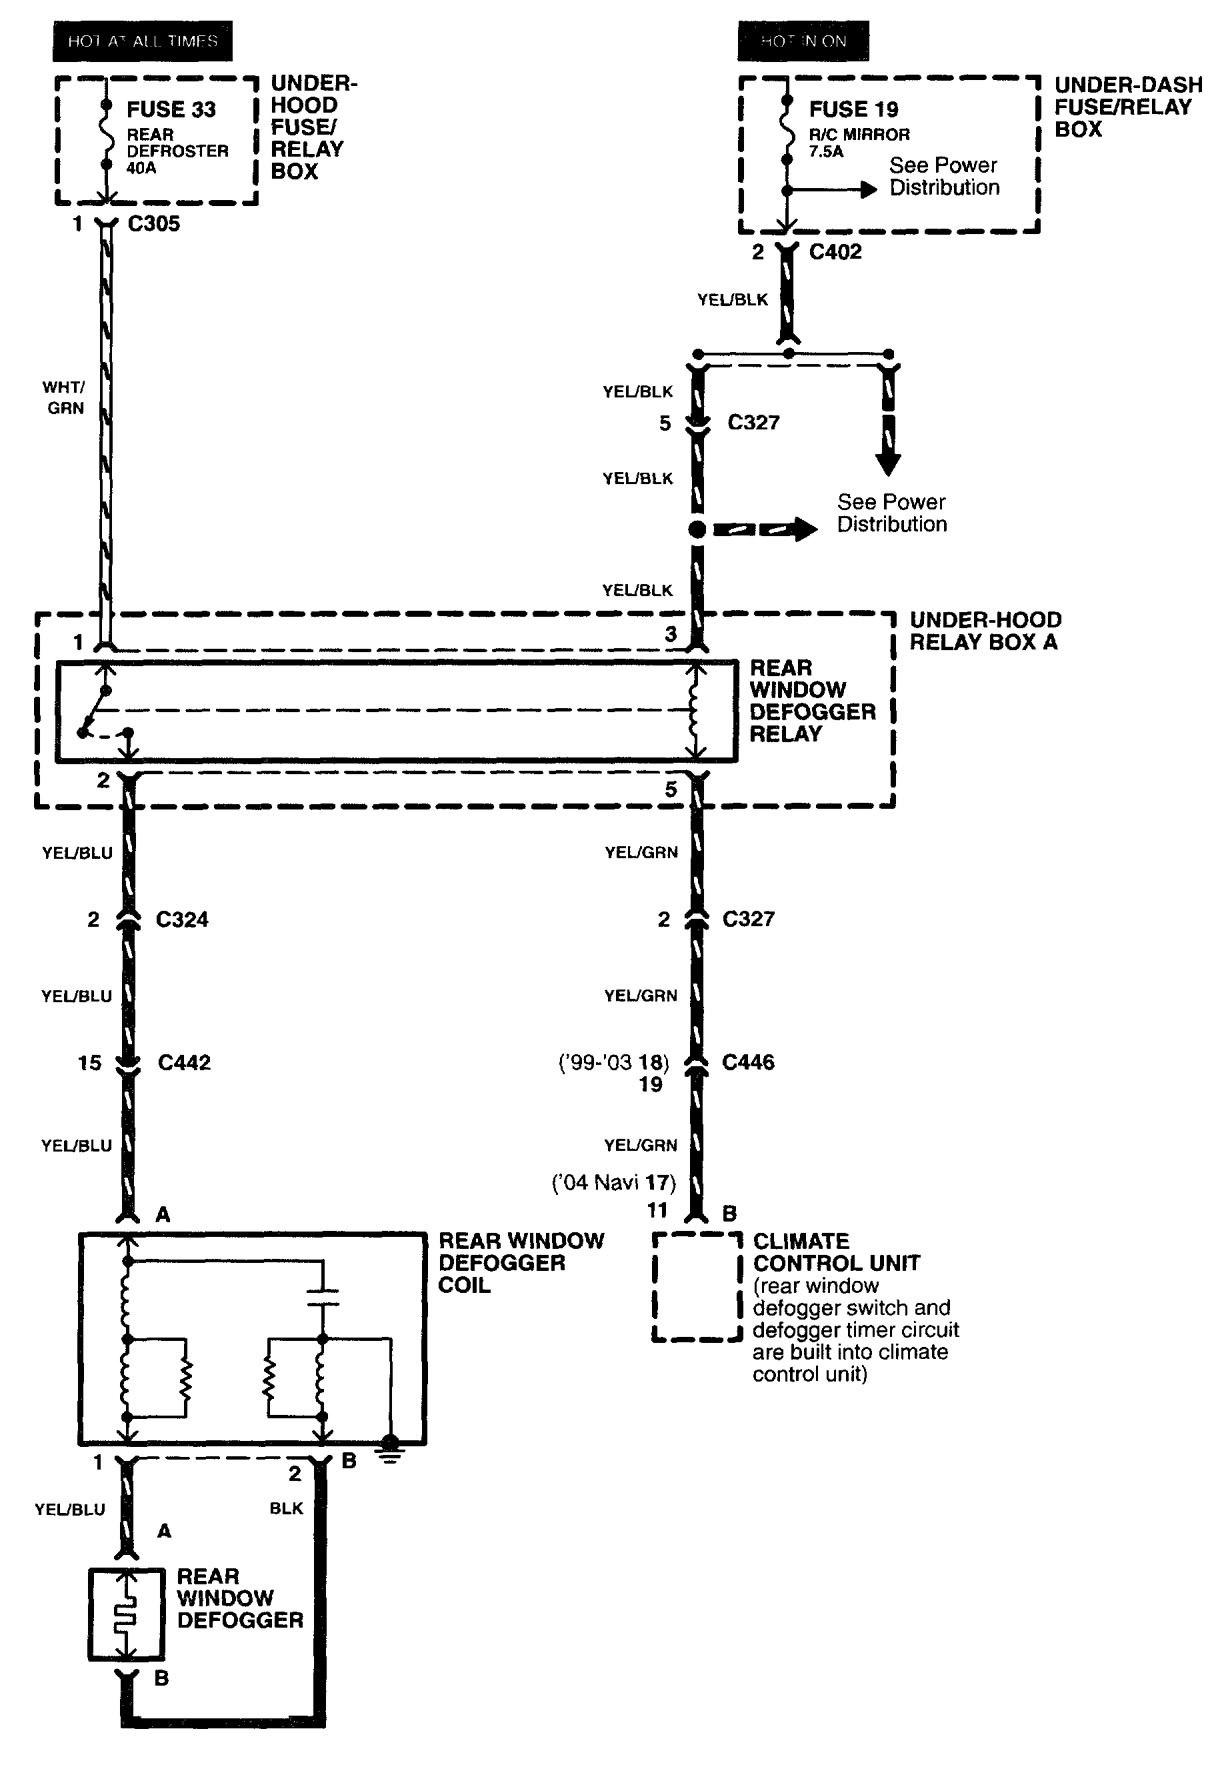 Acura Rl 2003 2004 Wiring Diagrams Rear Window Defogger Ferrari 456 Diagram